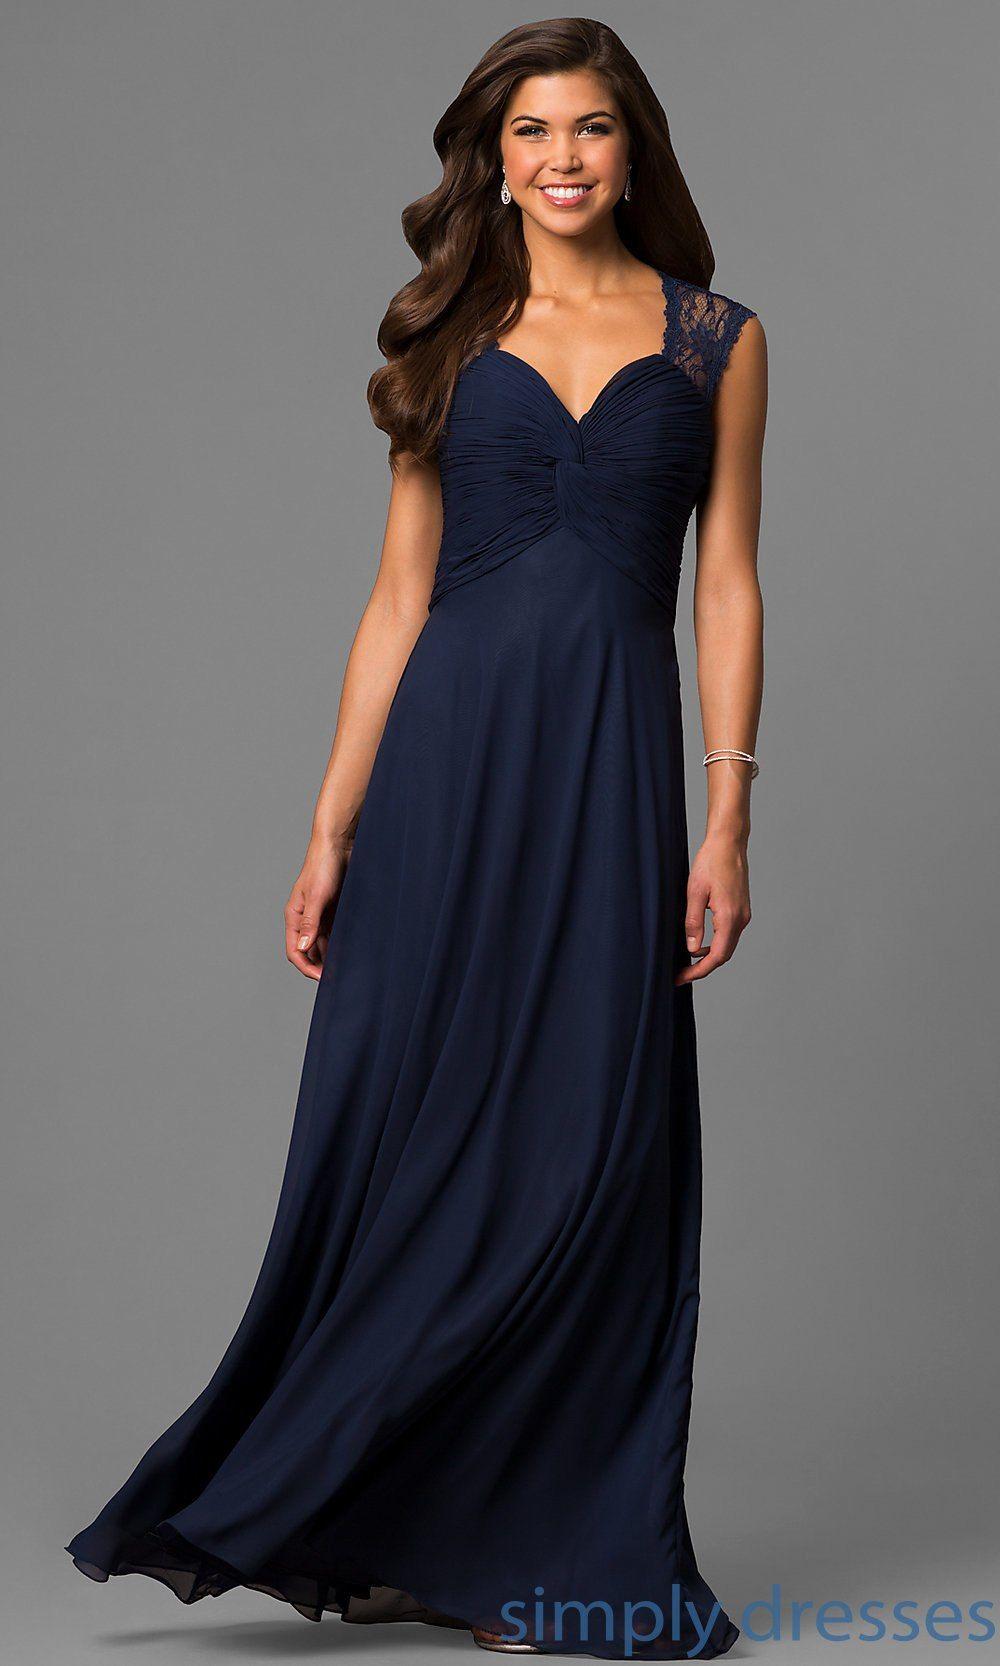 Fbglp elizabeth k long laceback prom dress long lace prom